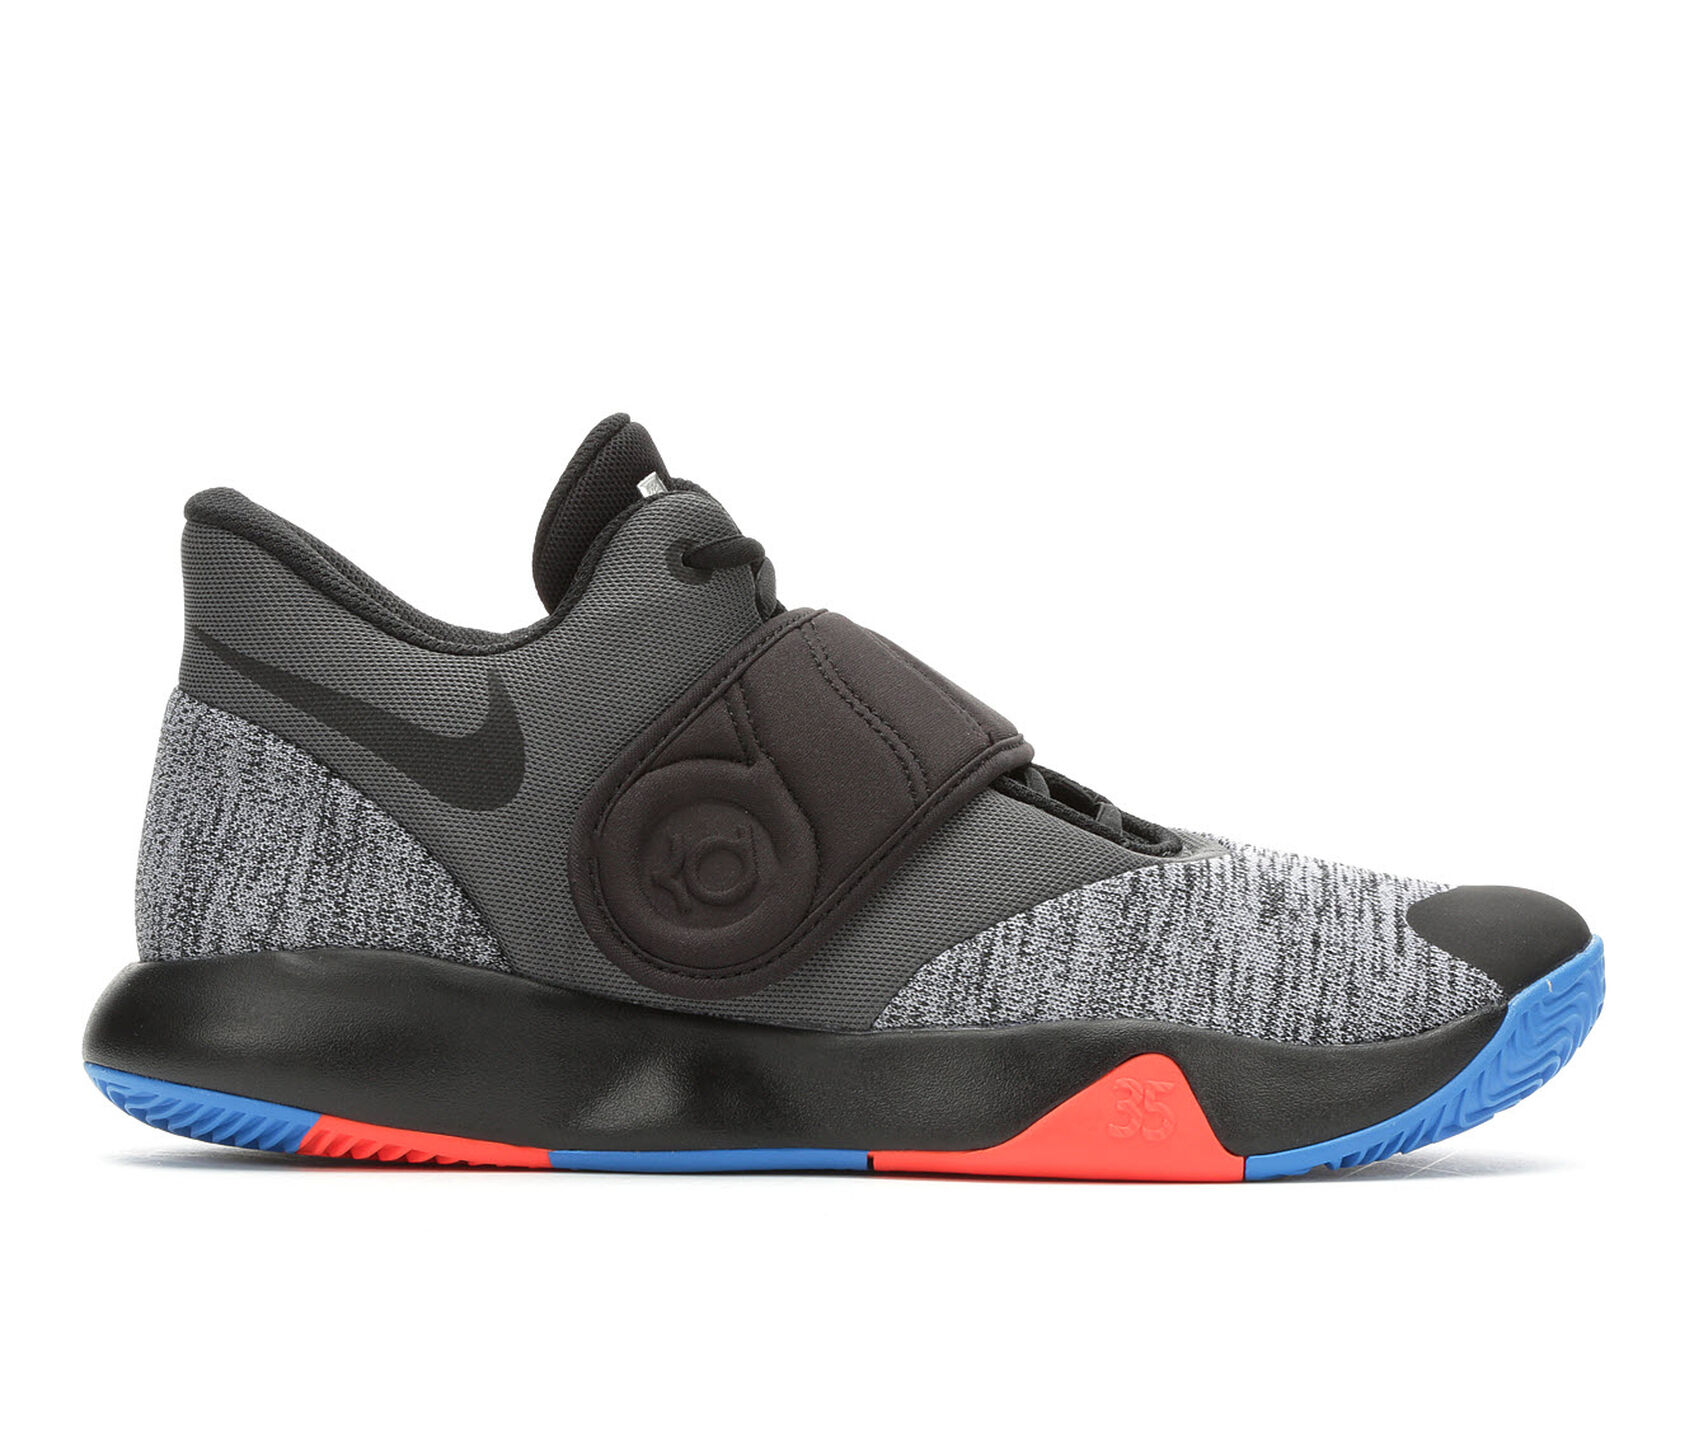 e05fae72509 Images. Men  39 s Nike KD Trey 5 VI High Top Basketball Shoes